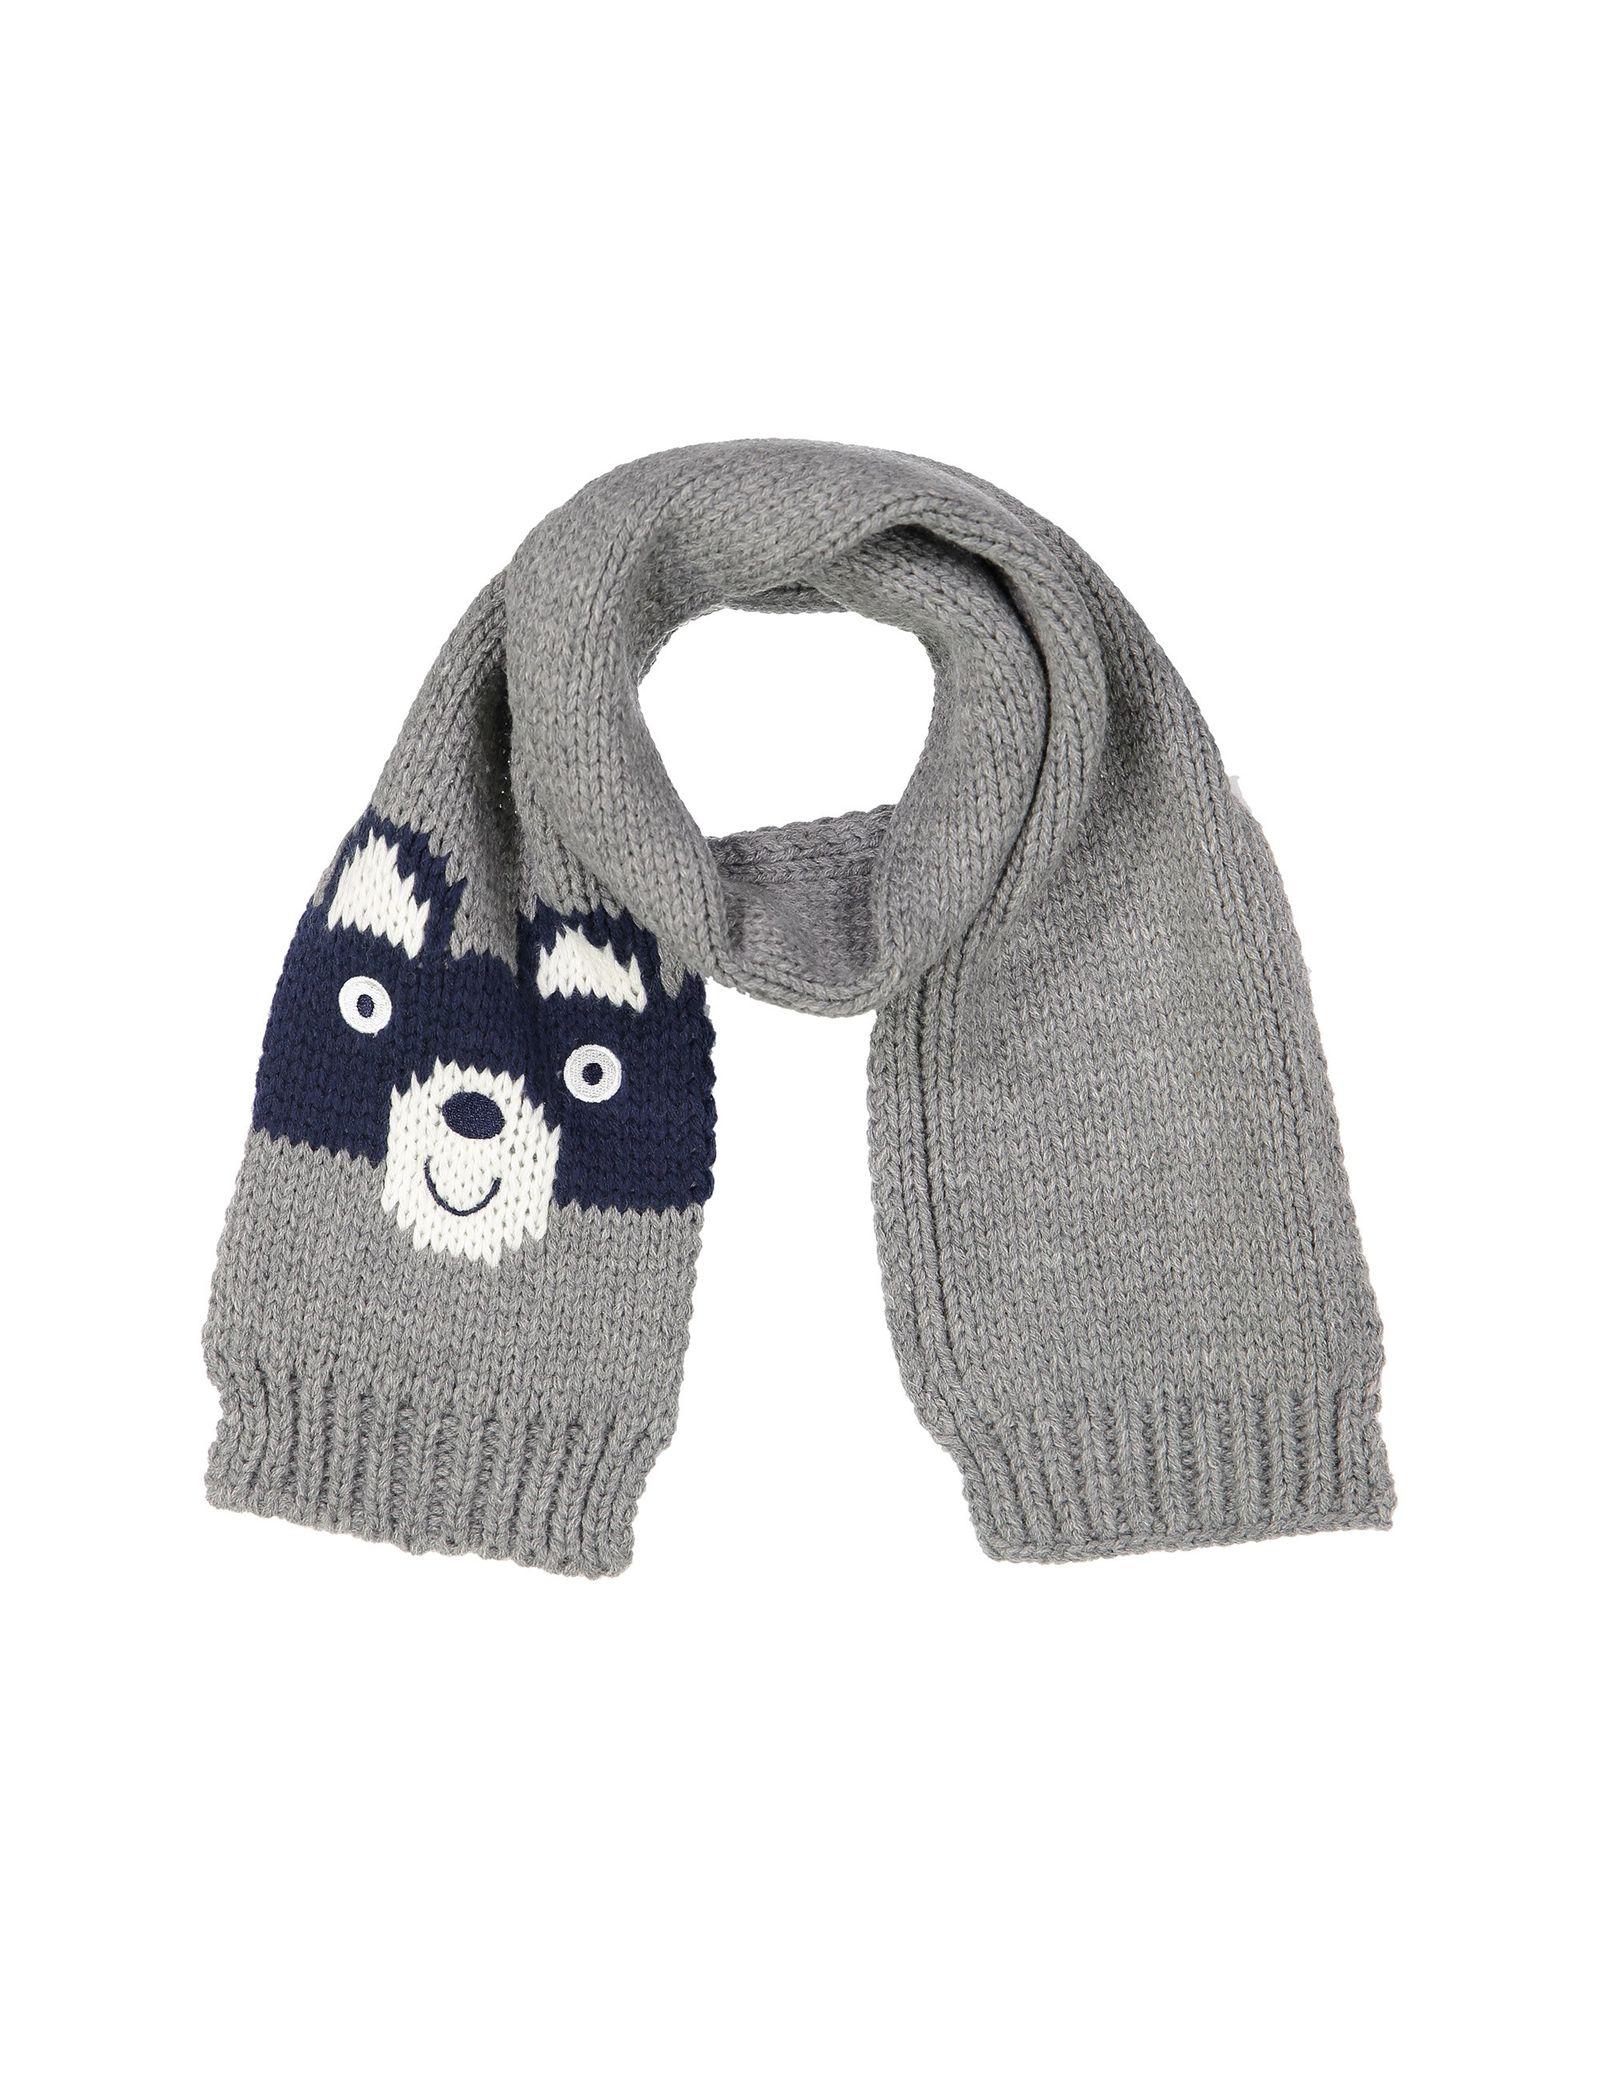 شال گردن بافتنی نوزادی پسرانه - ایدکس - طوسي - 1